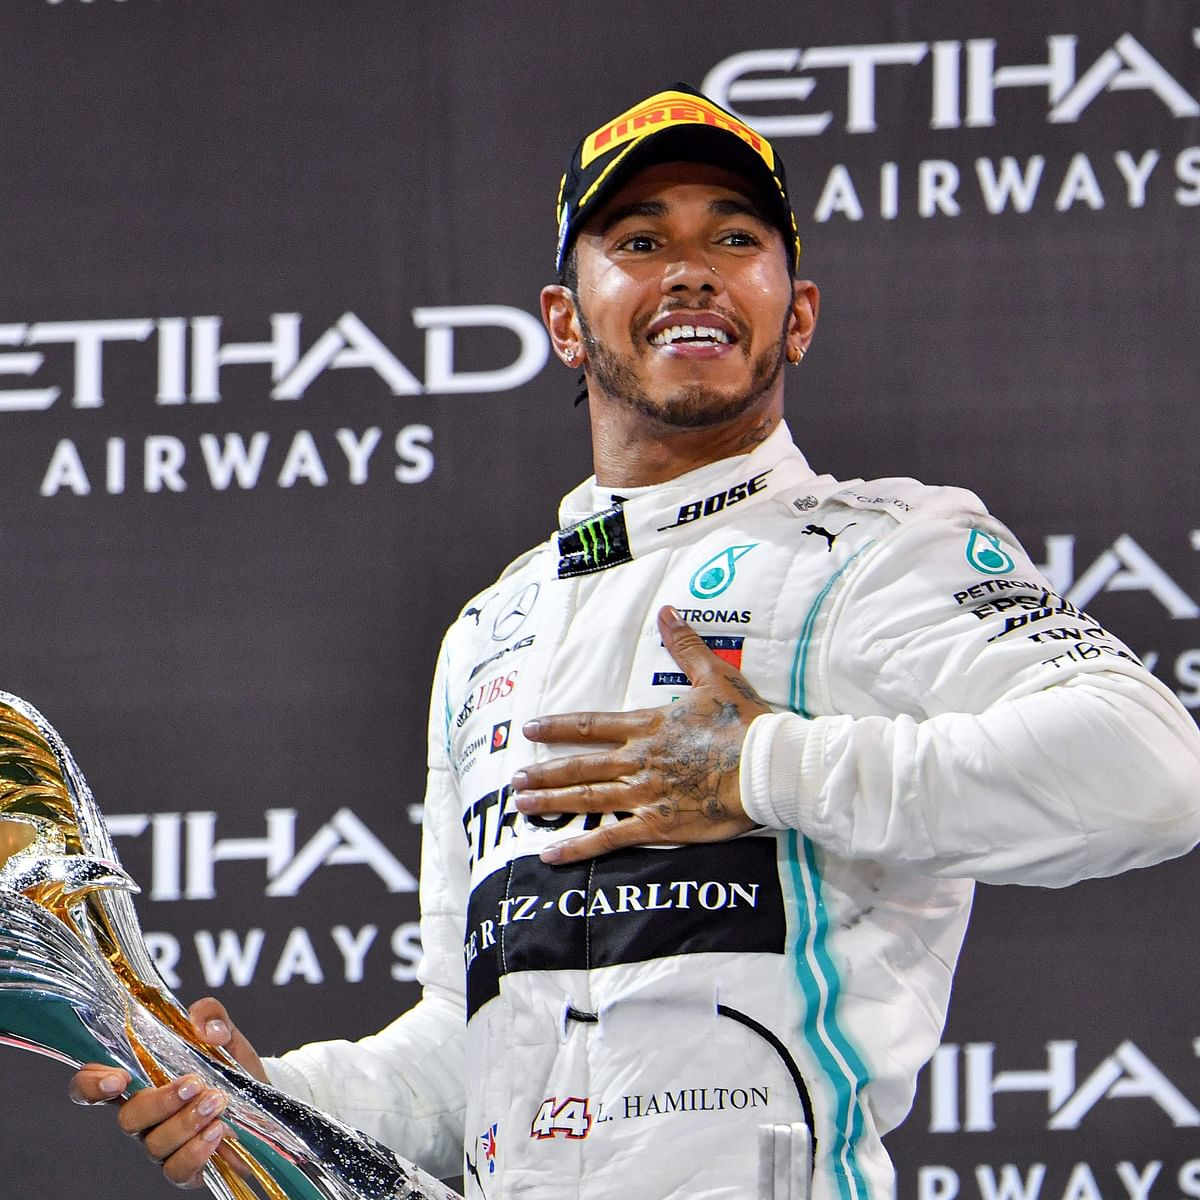 Lewis Hamilton claims record 156th podium finish with win at Spanish Grand Prix